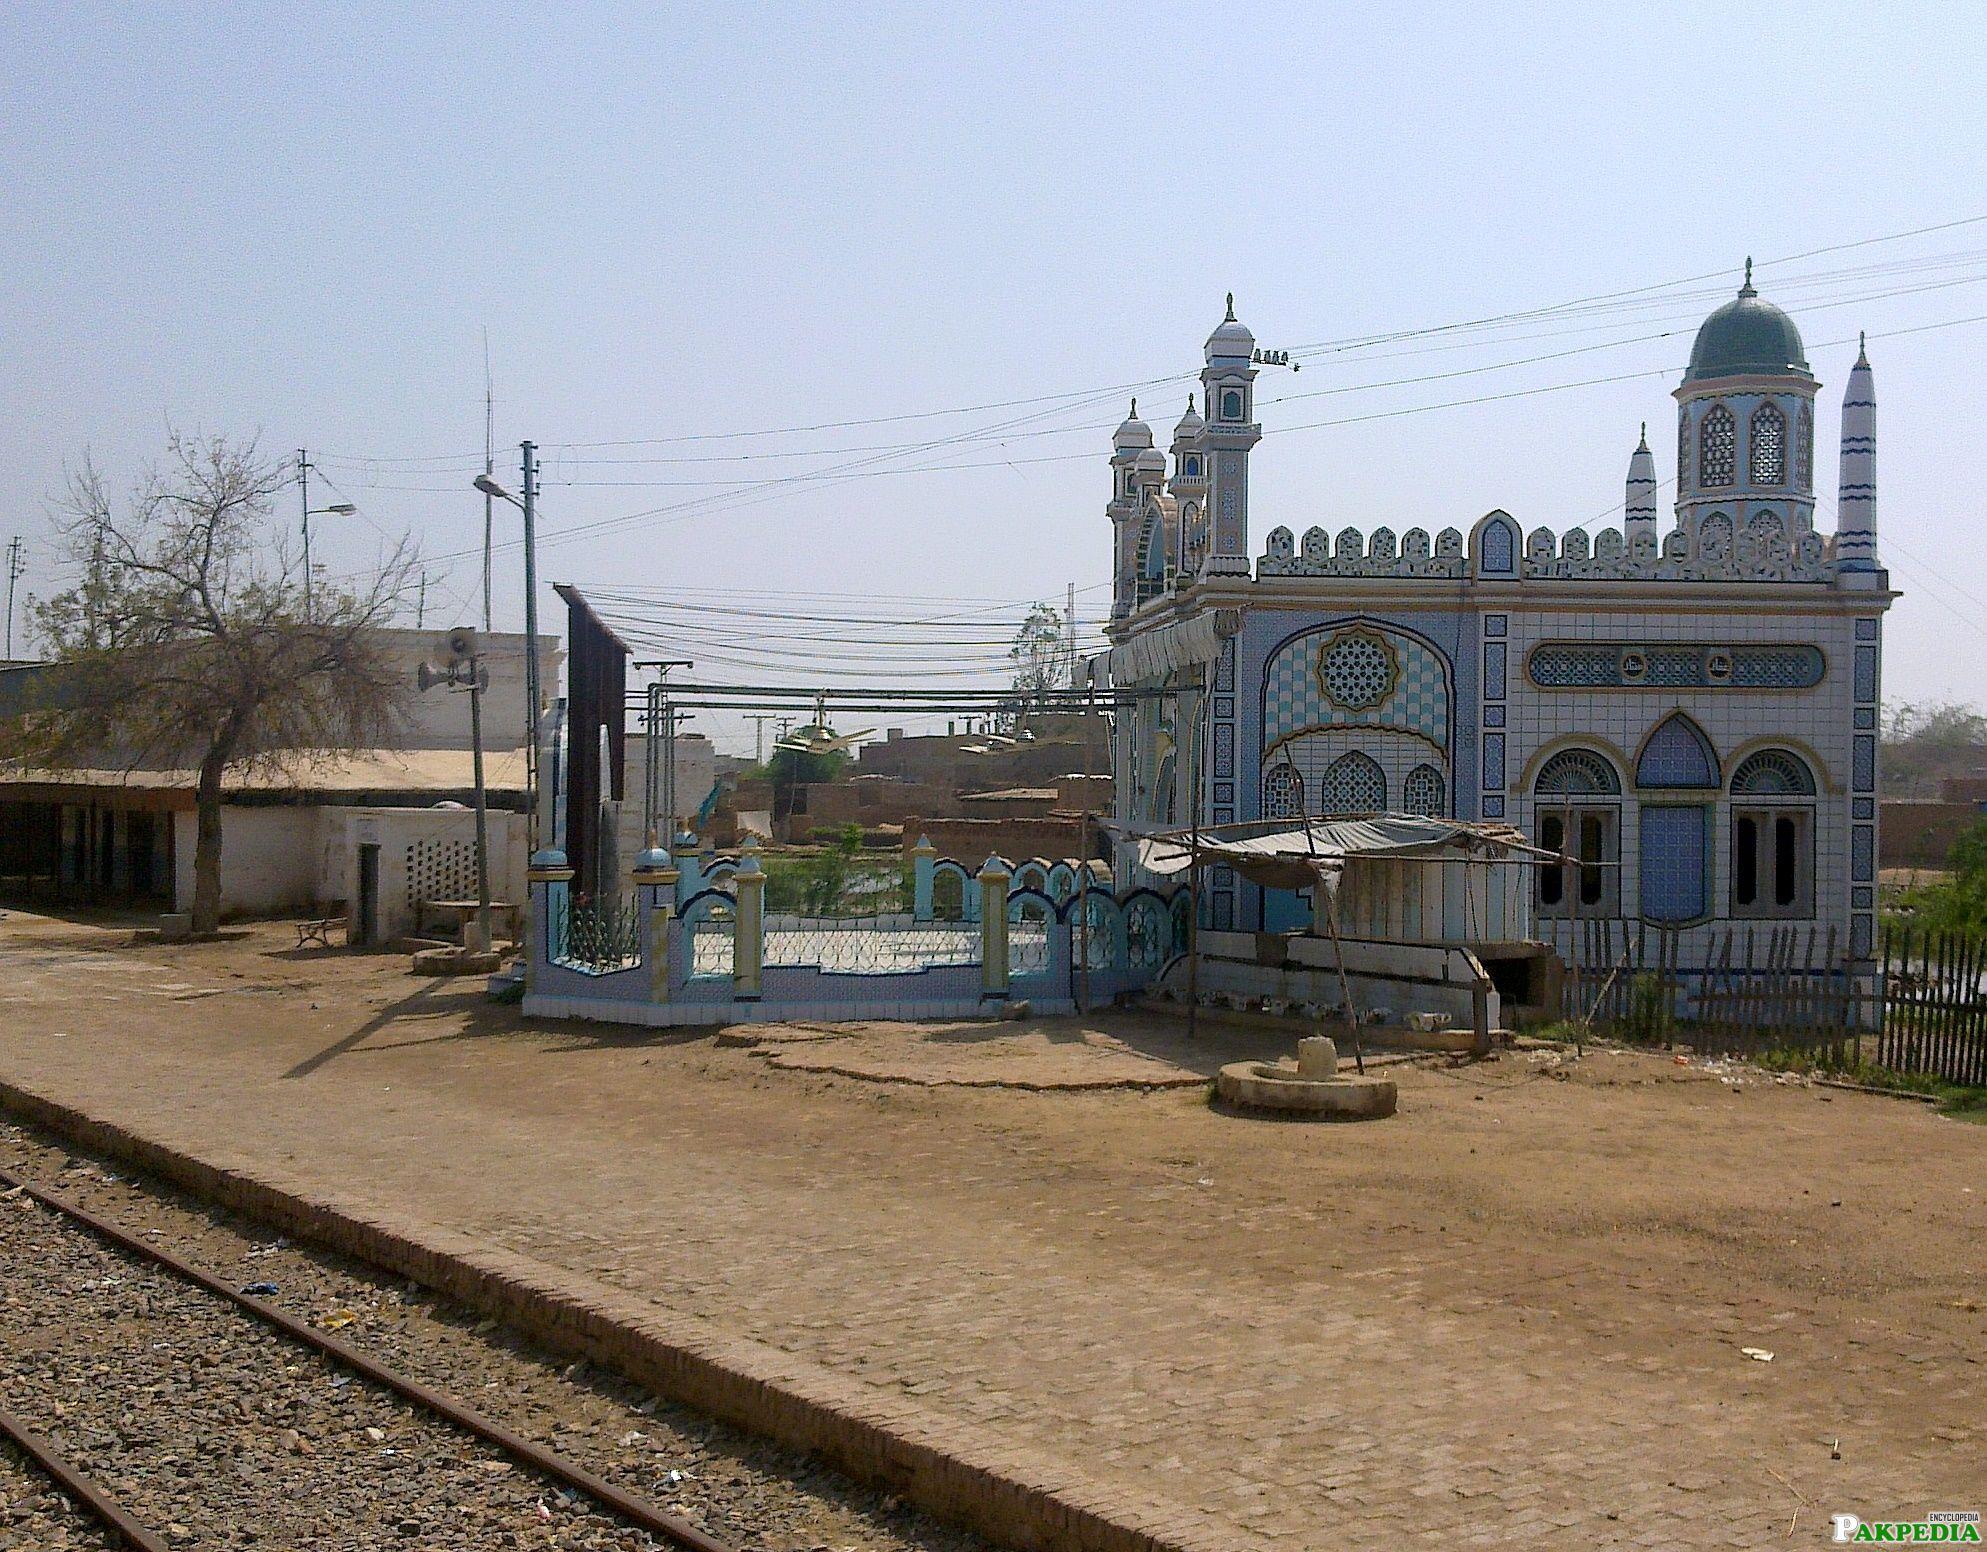 Dera Murad Jamali Mousqe